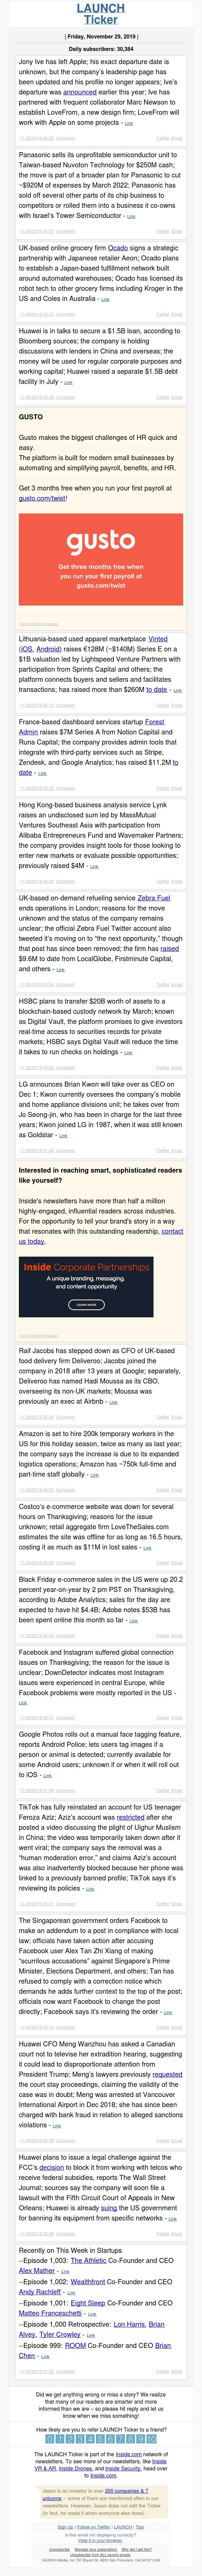 Jony Ive leaves Apple, Panasonic sells chip unit to Nuvoton for $250M